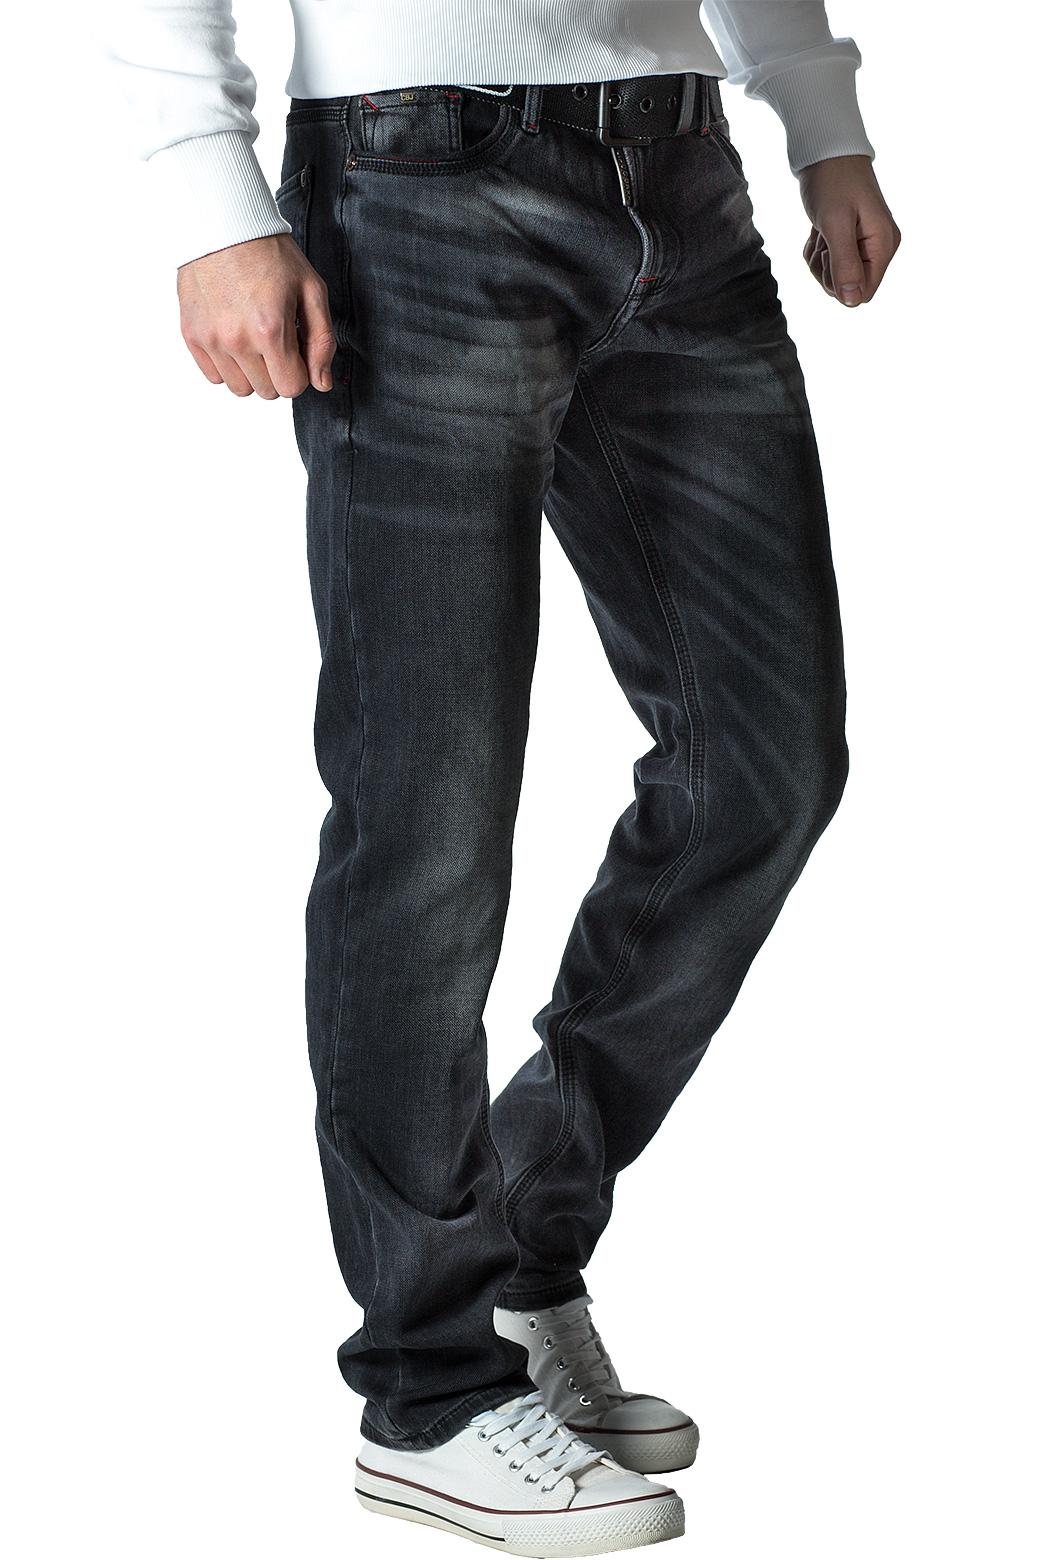 Cipo-amp-Baxx-Uomo-Jeans-Pantaloni-ricamate-Biker-Style-streetwear-nervature-pattern-Dope miniatura 26